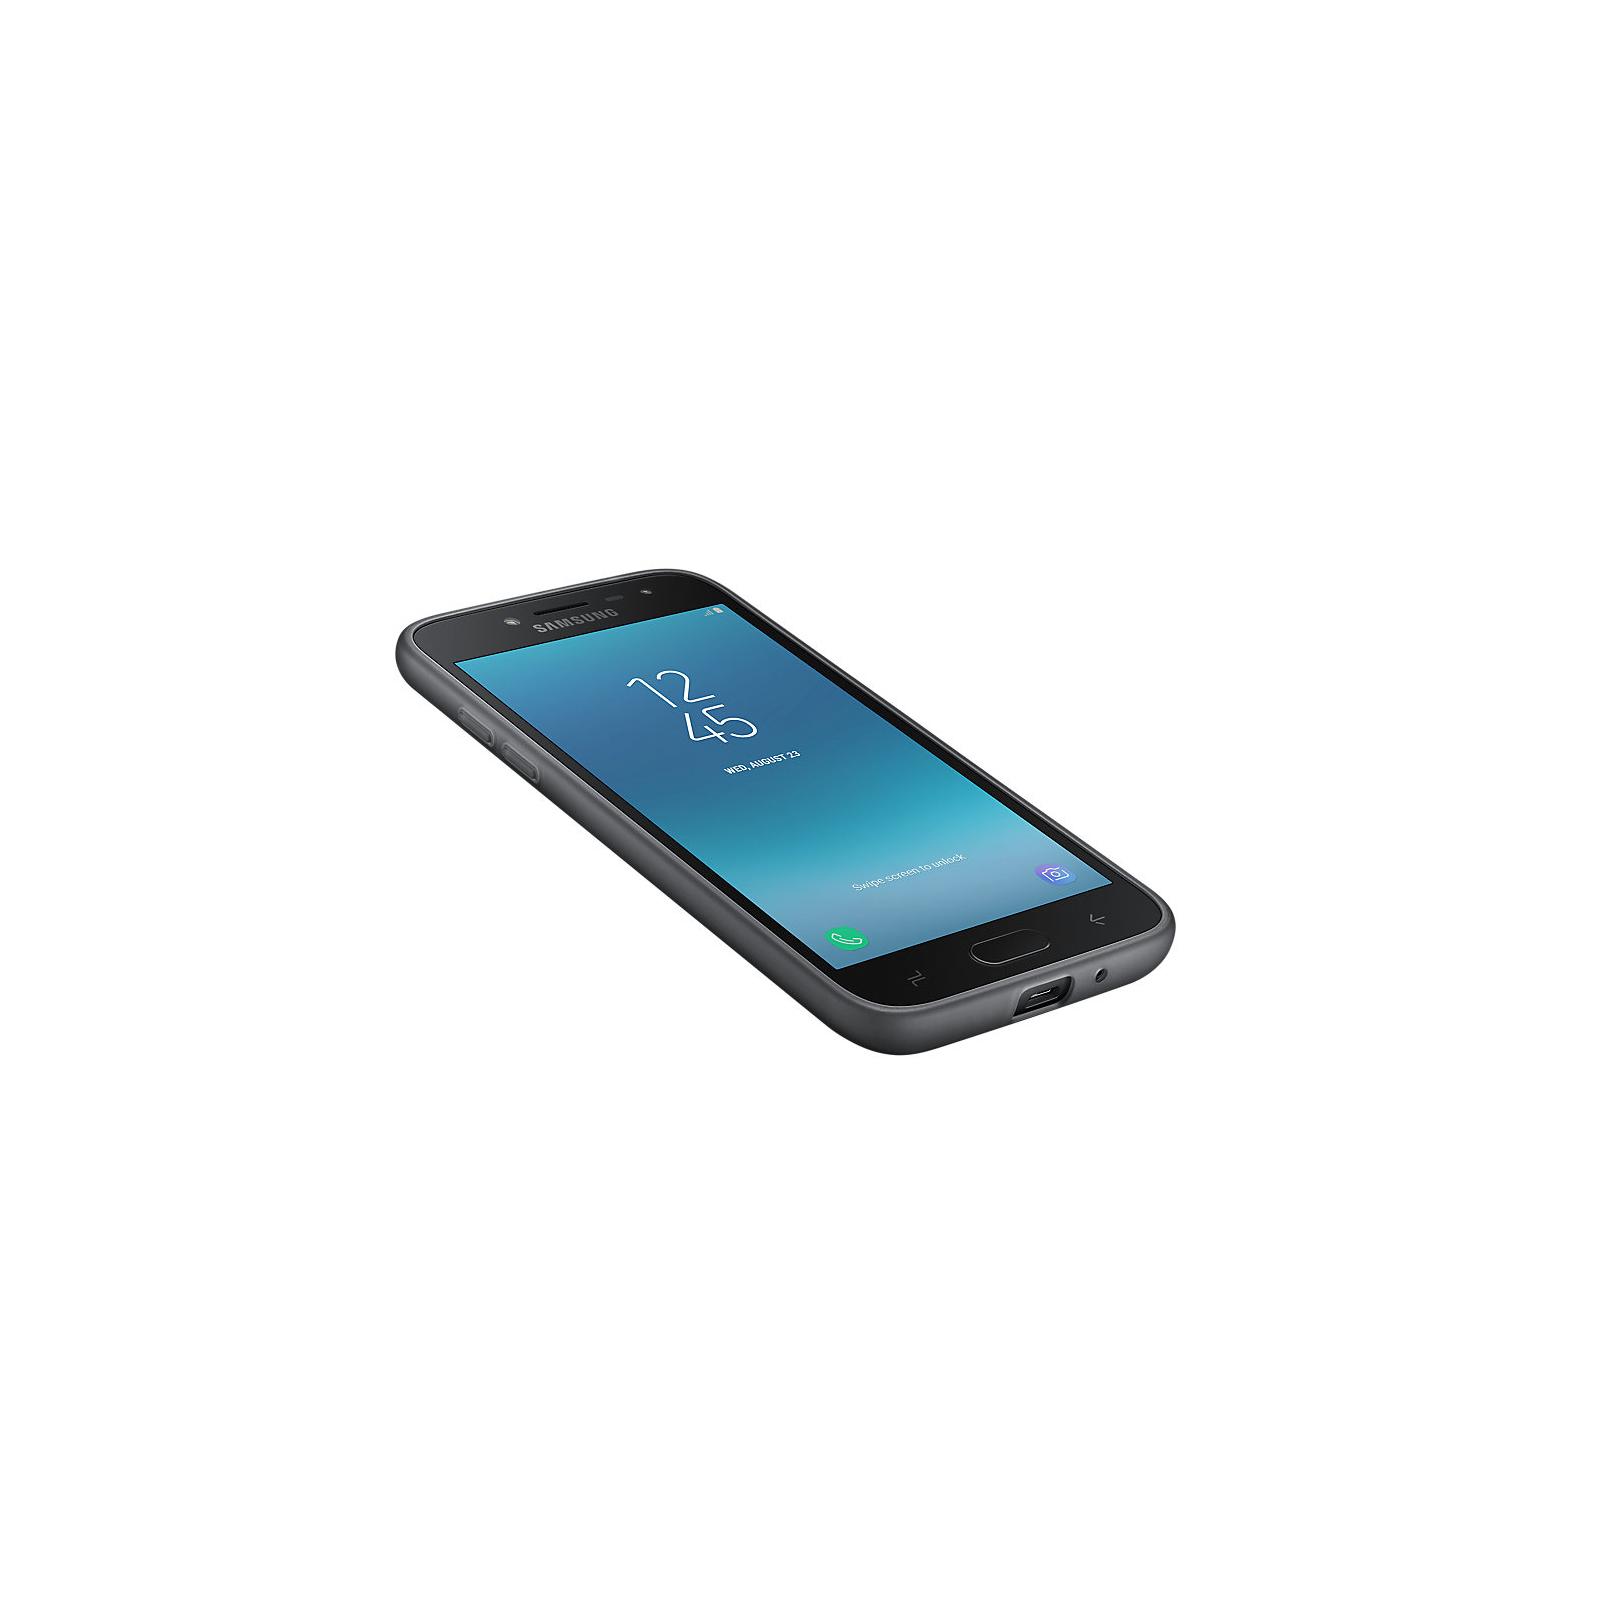 samsung galaxy smartphone - 792×792